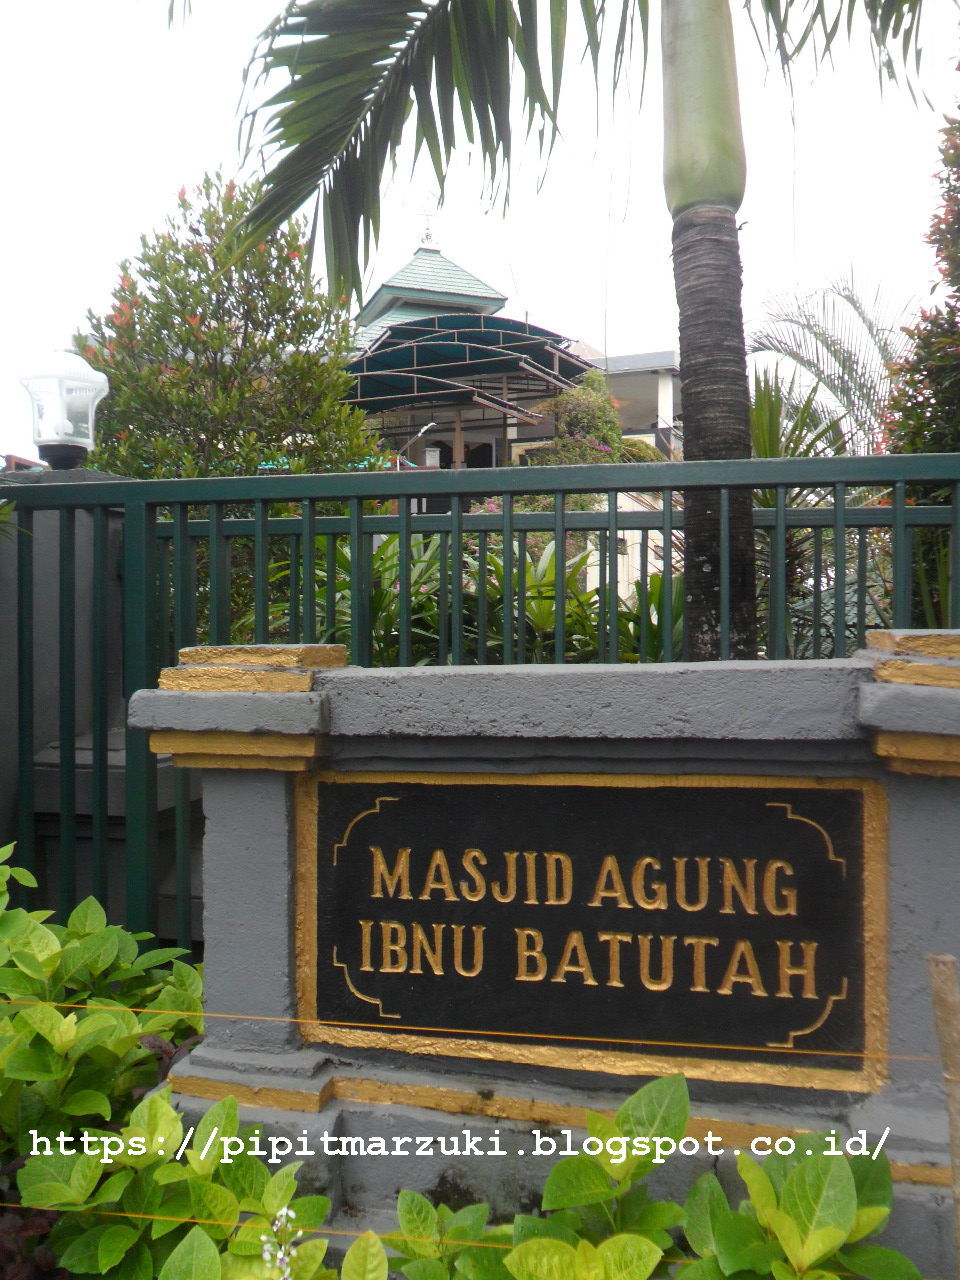 Pipit Marzuki Tanjung Benoa Nusa Dua Puja Mandala Berakhir Masjid